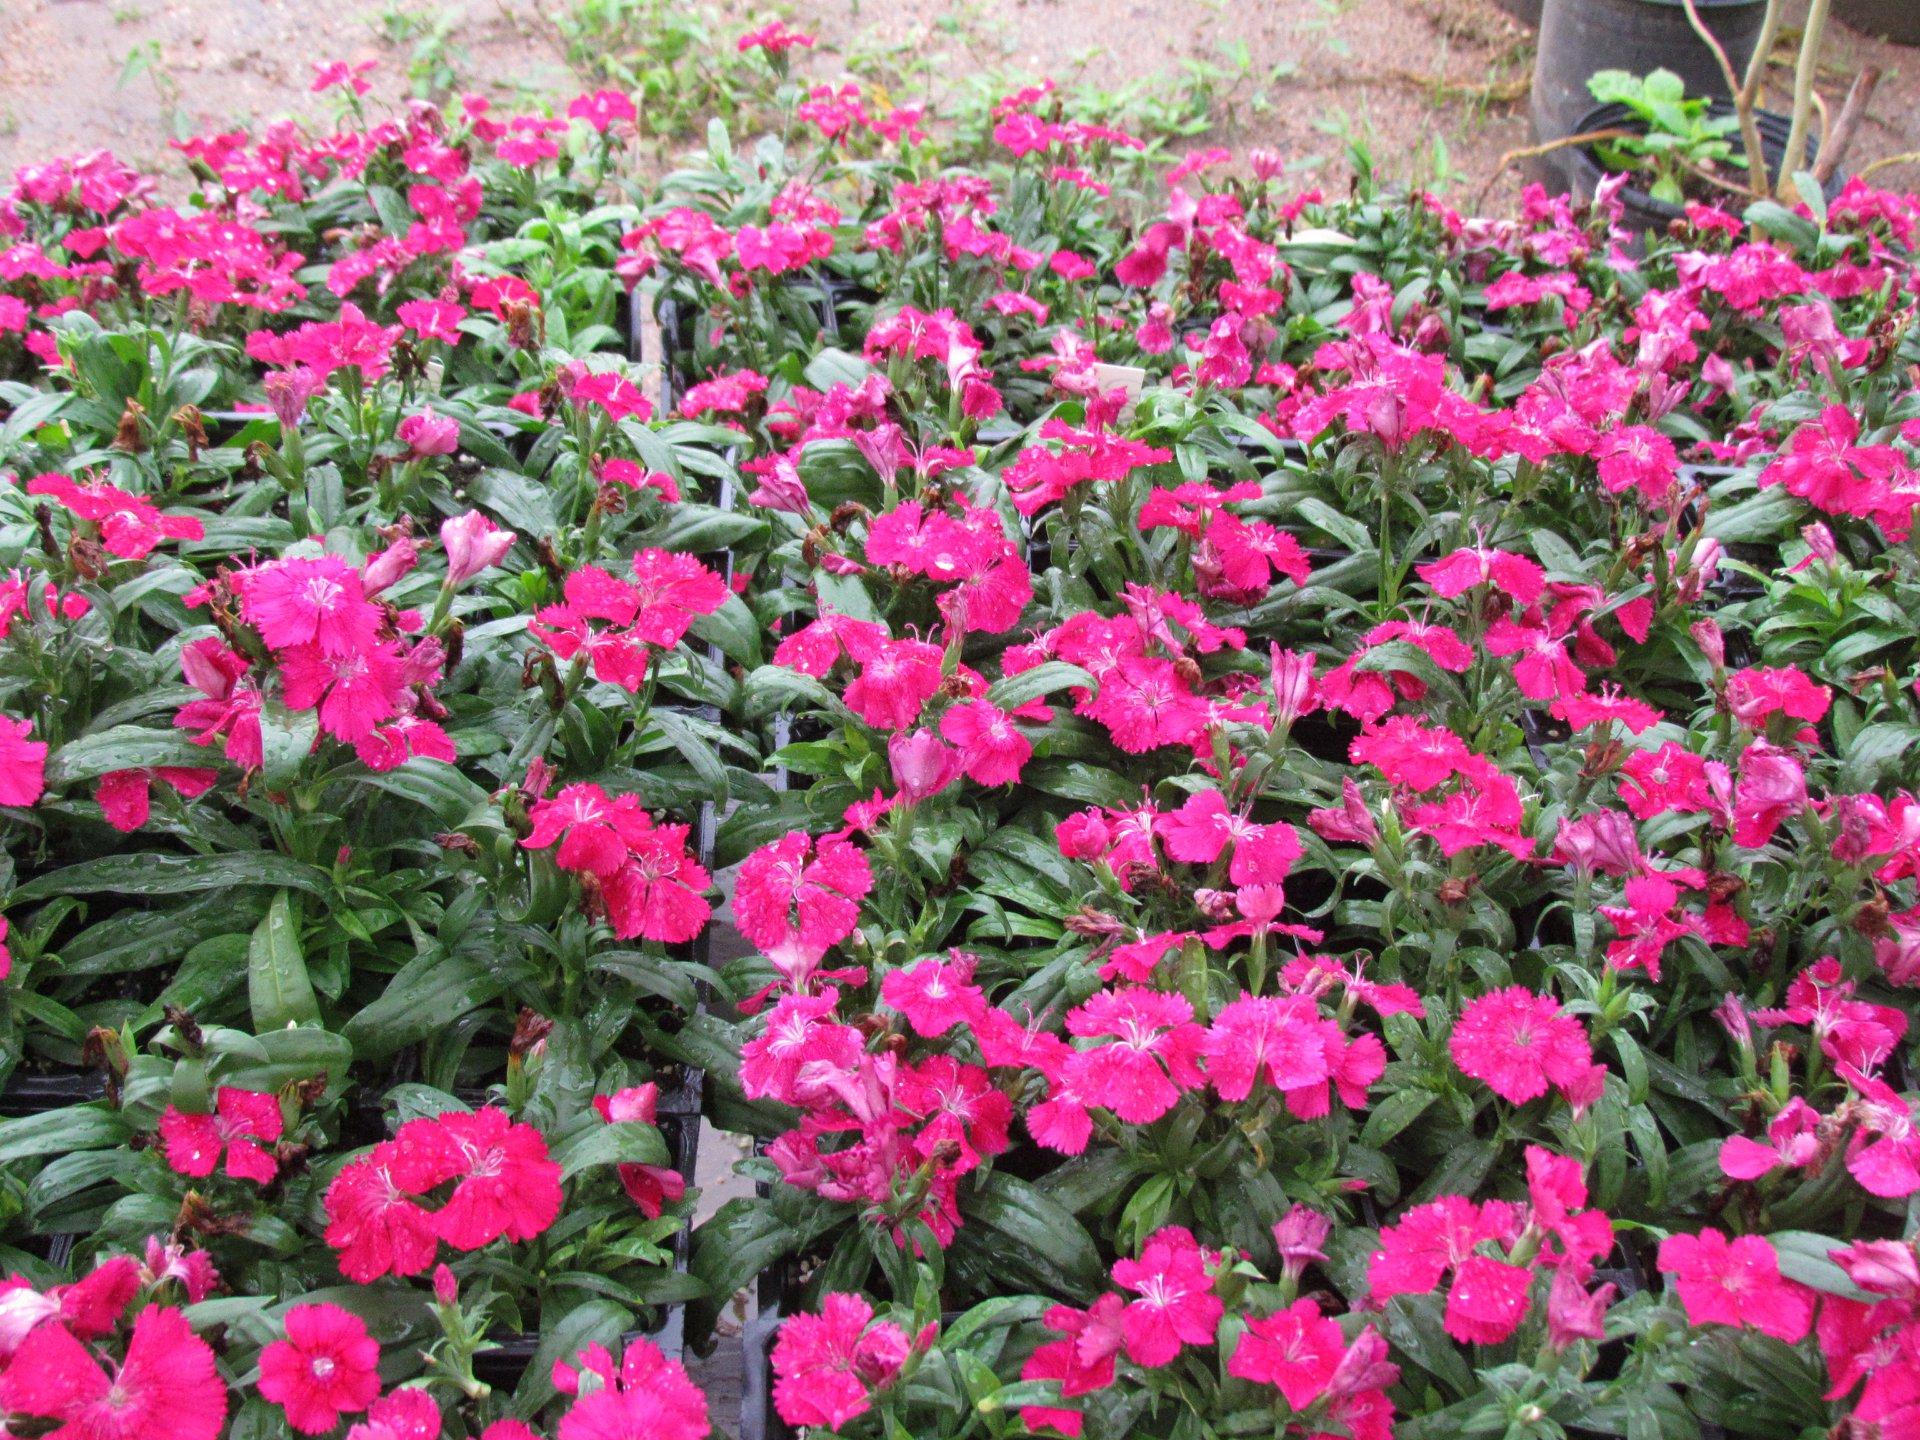 New Flats Of Flowers And Succulents At Jj Nursery J J Nursery